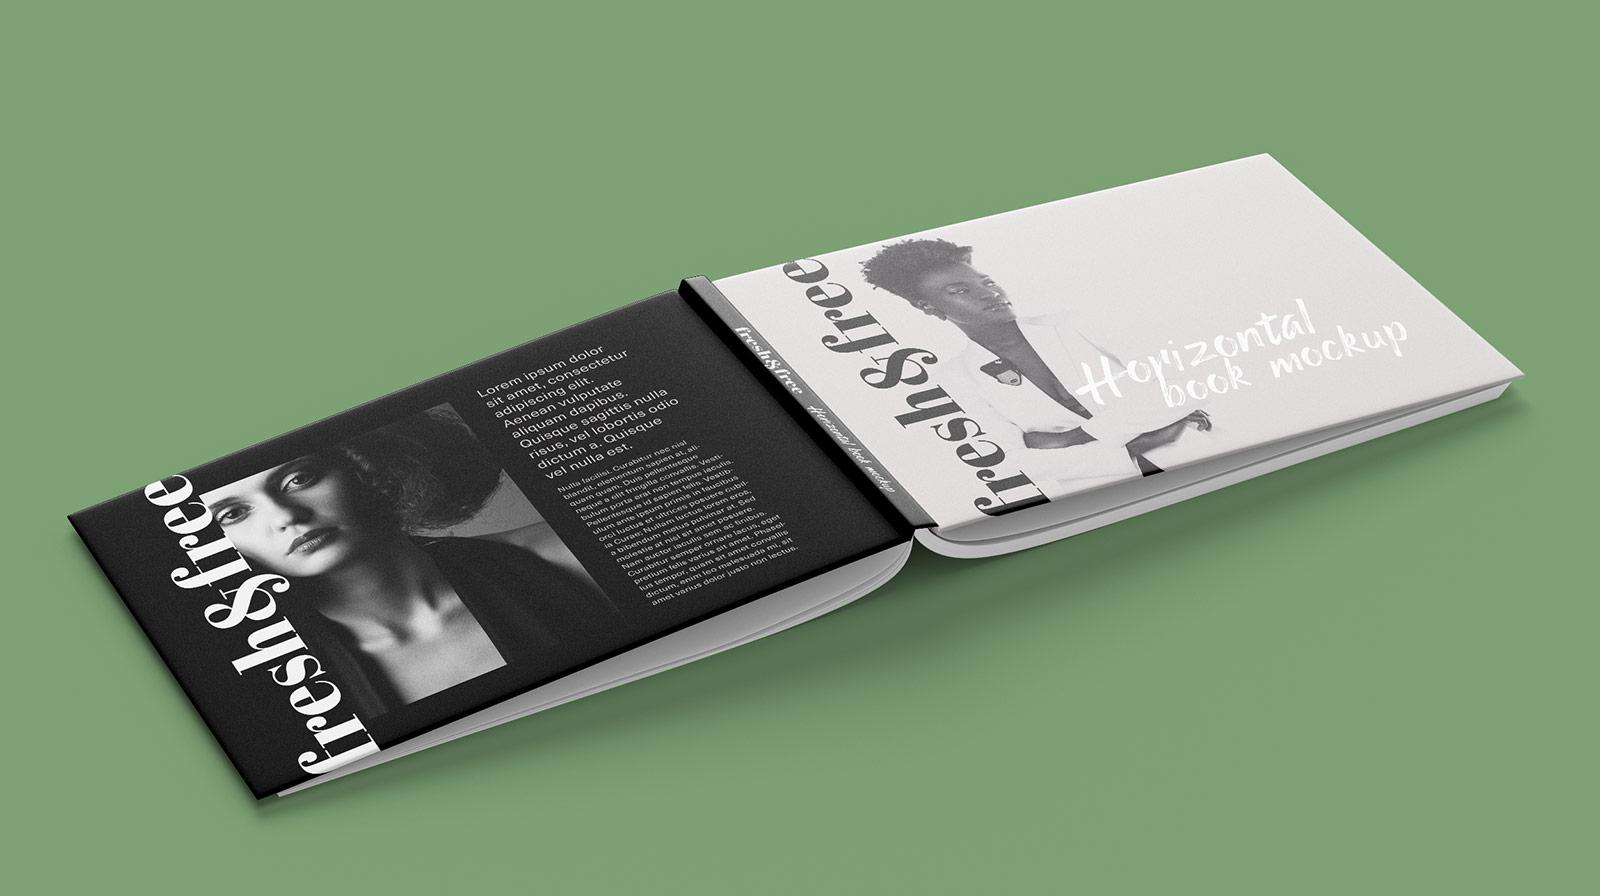 Free Horizontal A4 Size Book Mockup PSD (1)